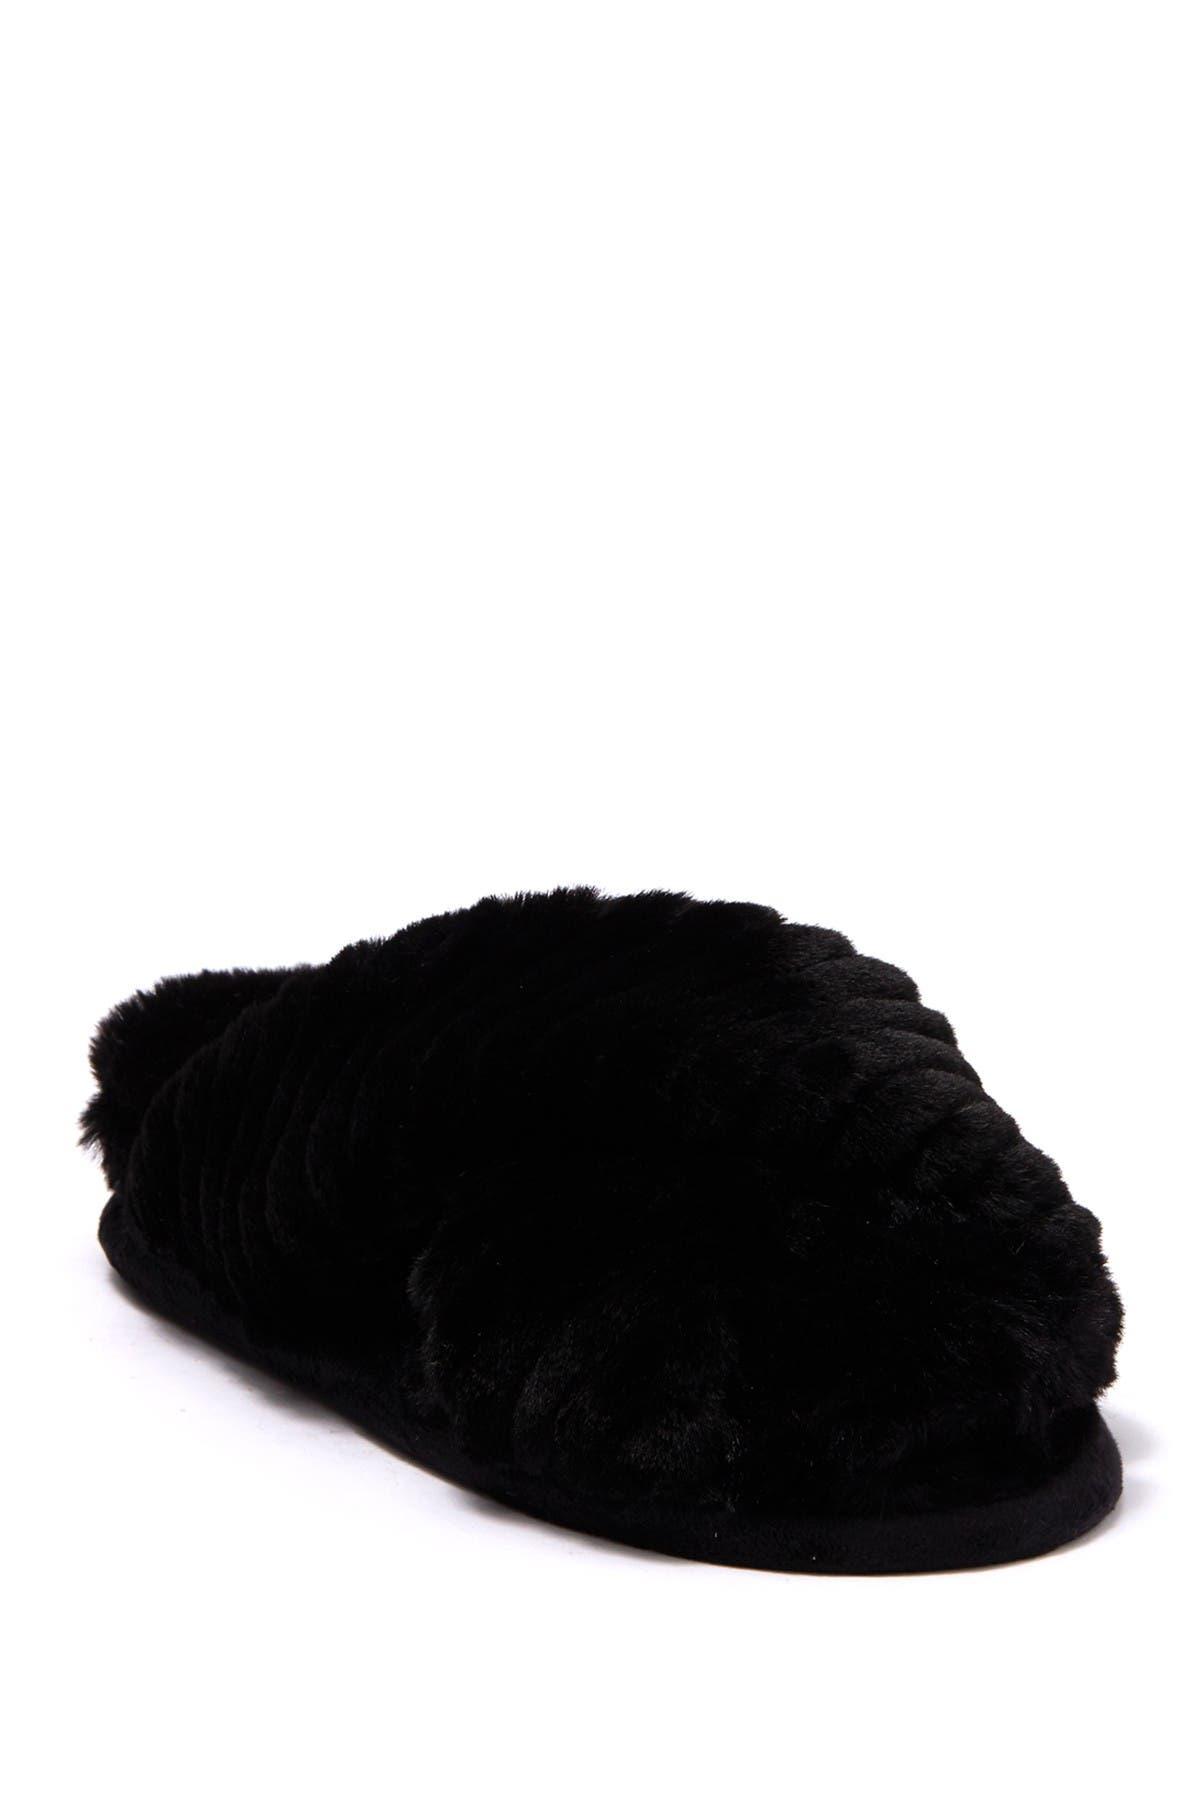 Image of Abound Sasha Faux Fur Slipper